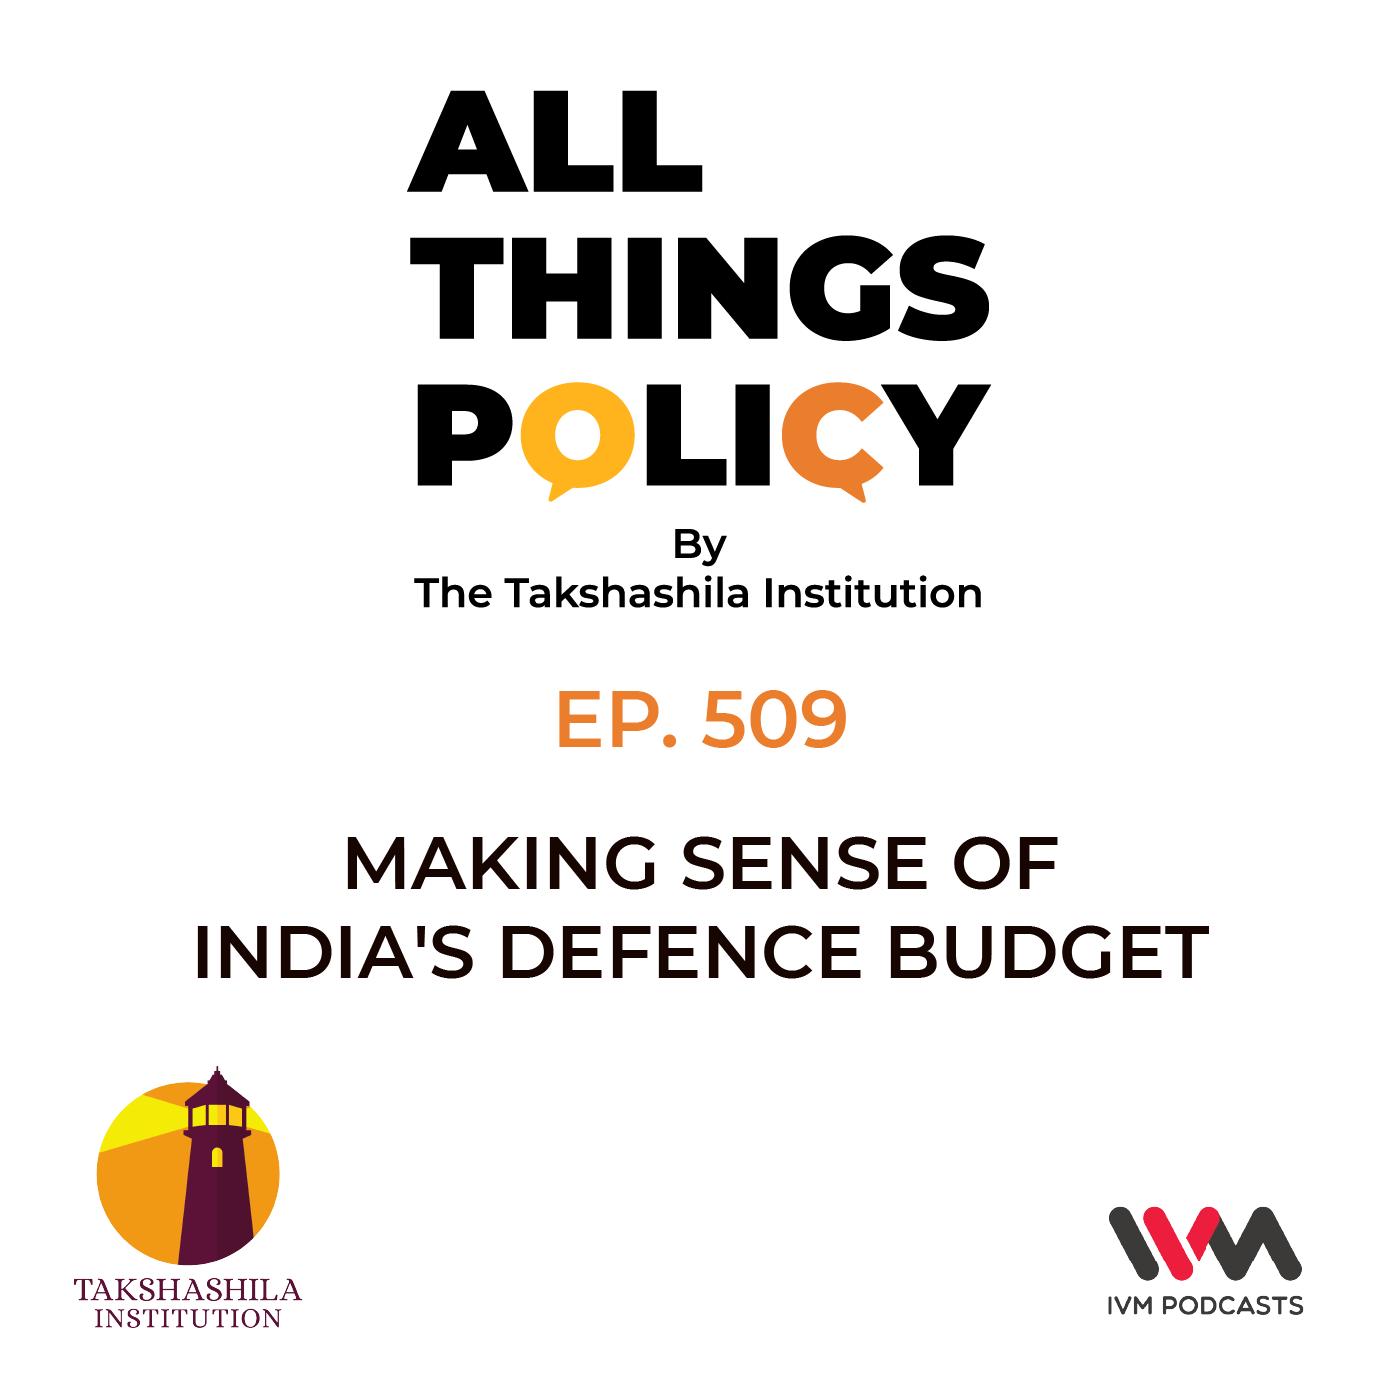 Ep. 509: Making Sense of India's Defence Budget